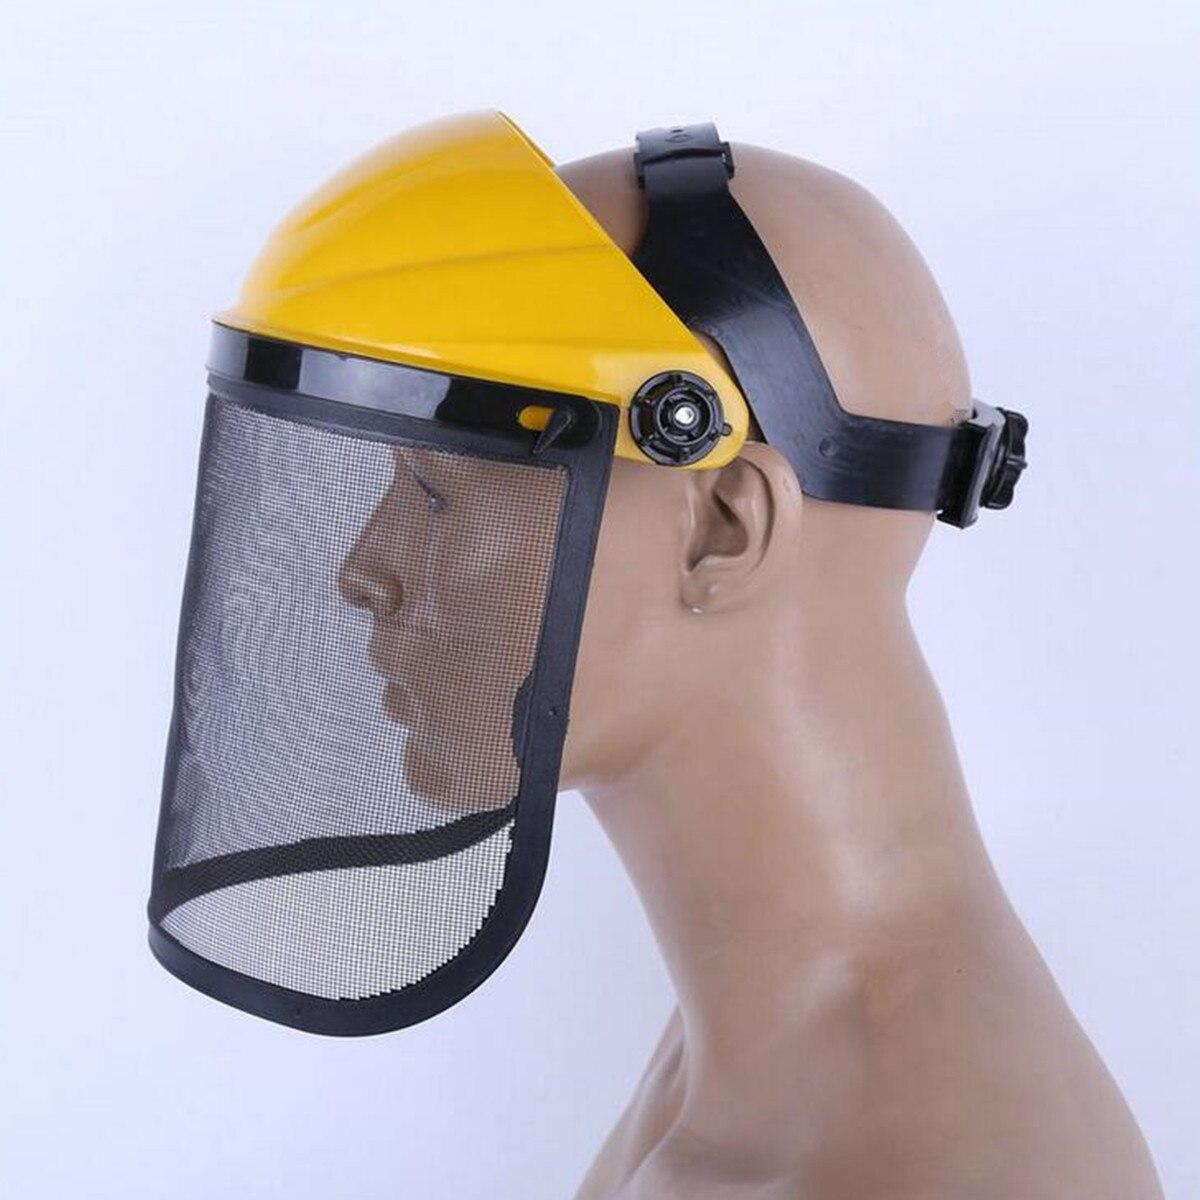 Large Steel Metal Mesh Visor Safety Helmet Hat For Chainsaw Brush Cutter Forestry Mower Face Protective Mask Anti-shock Visors